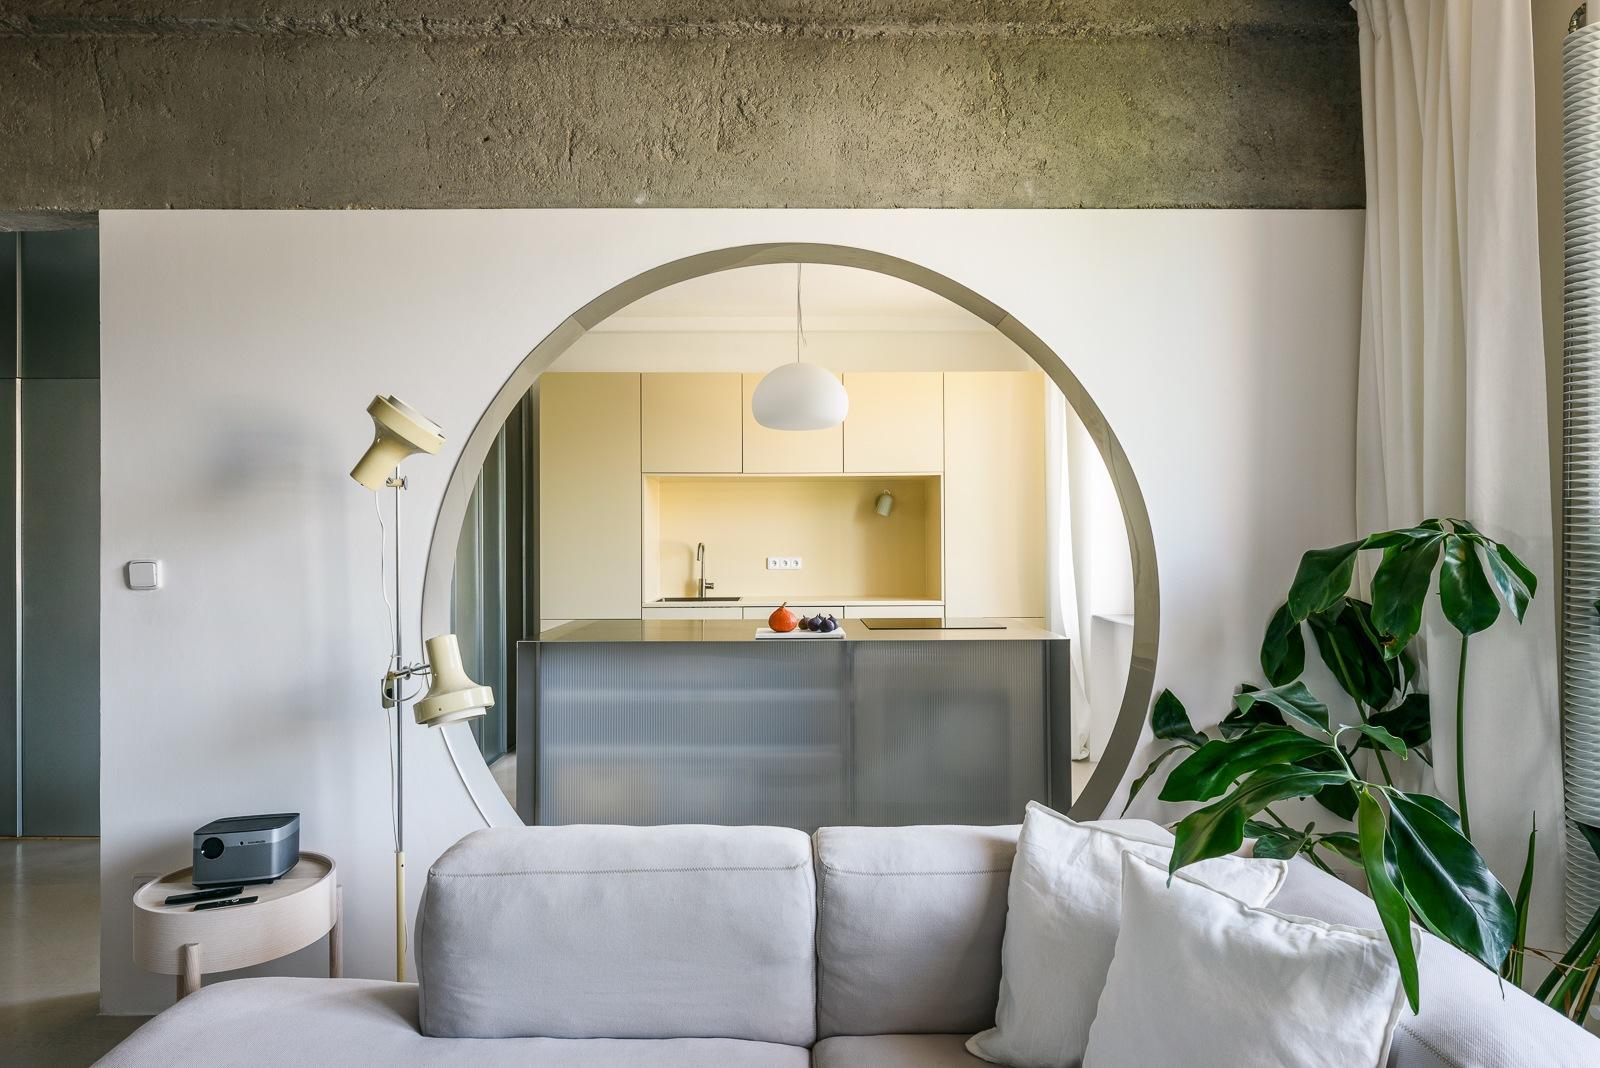 500 bytov, prerábka, trojizbový byt